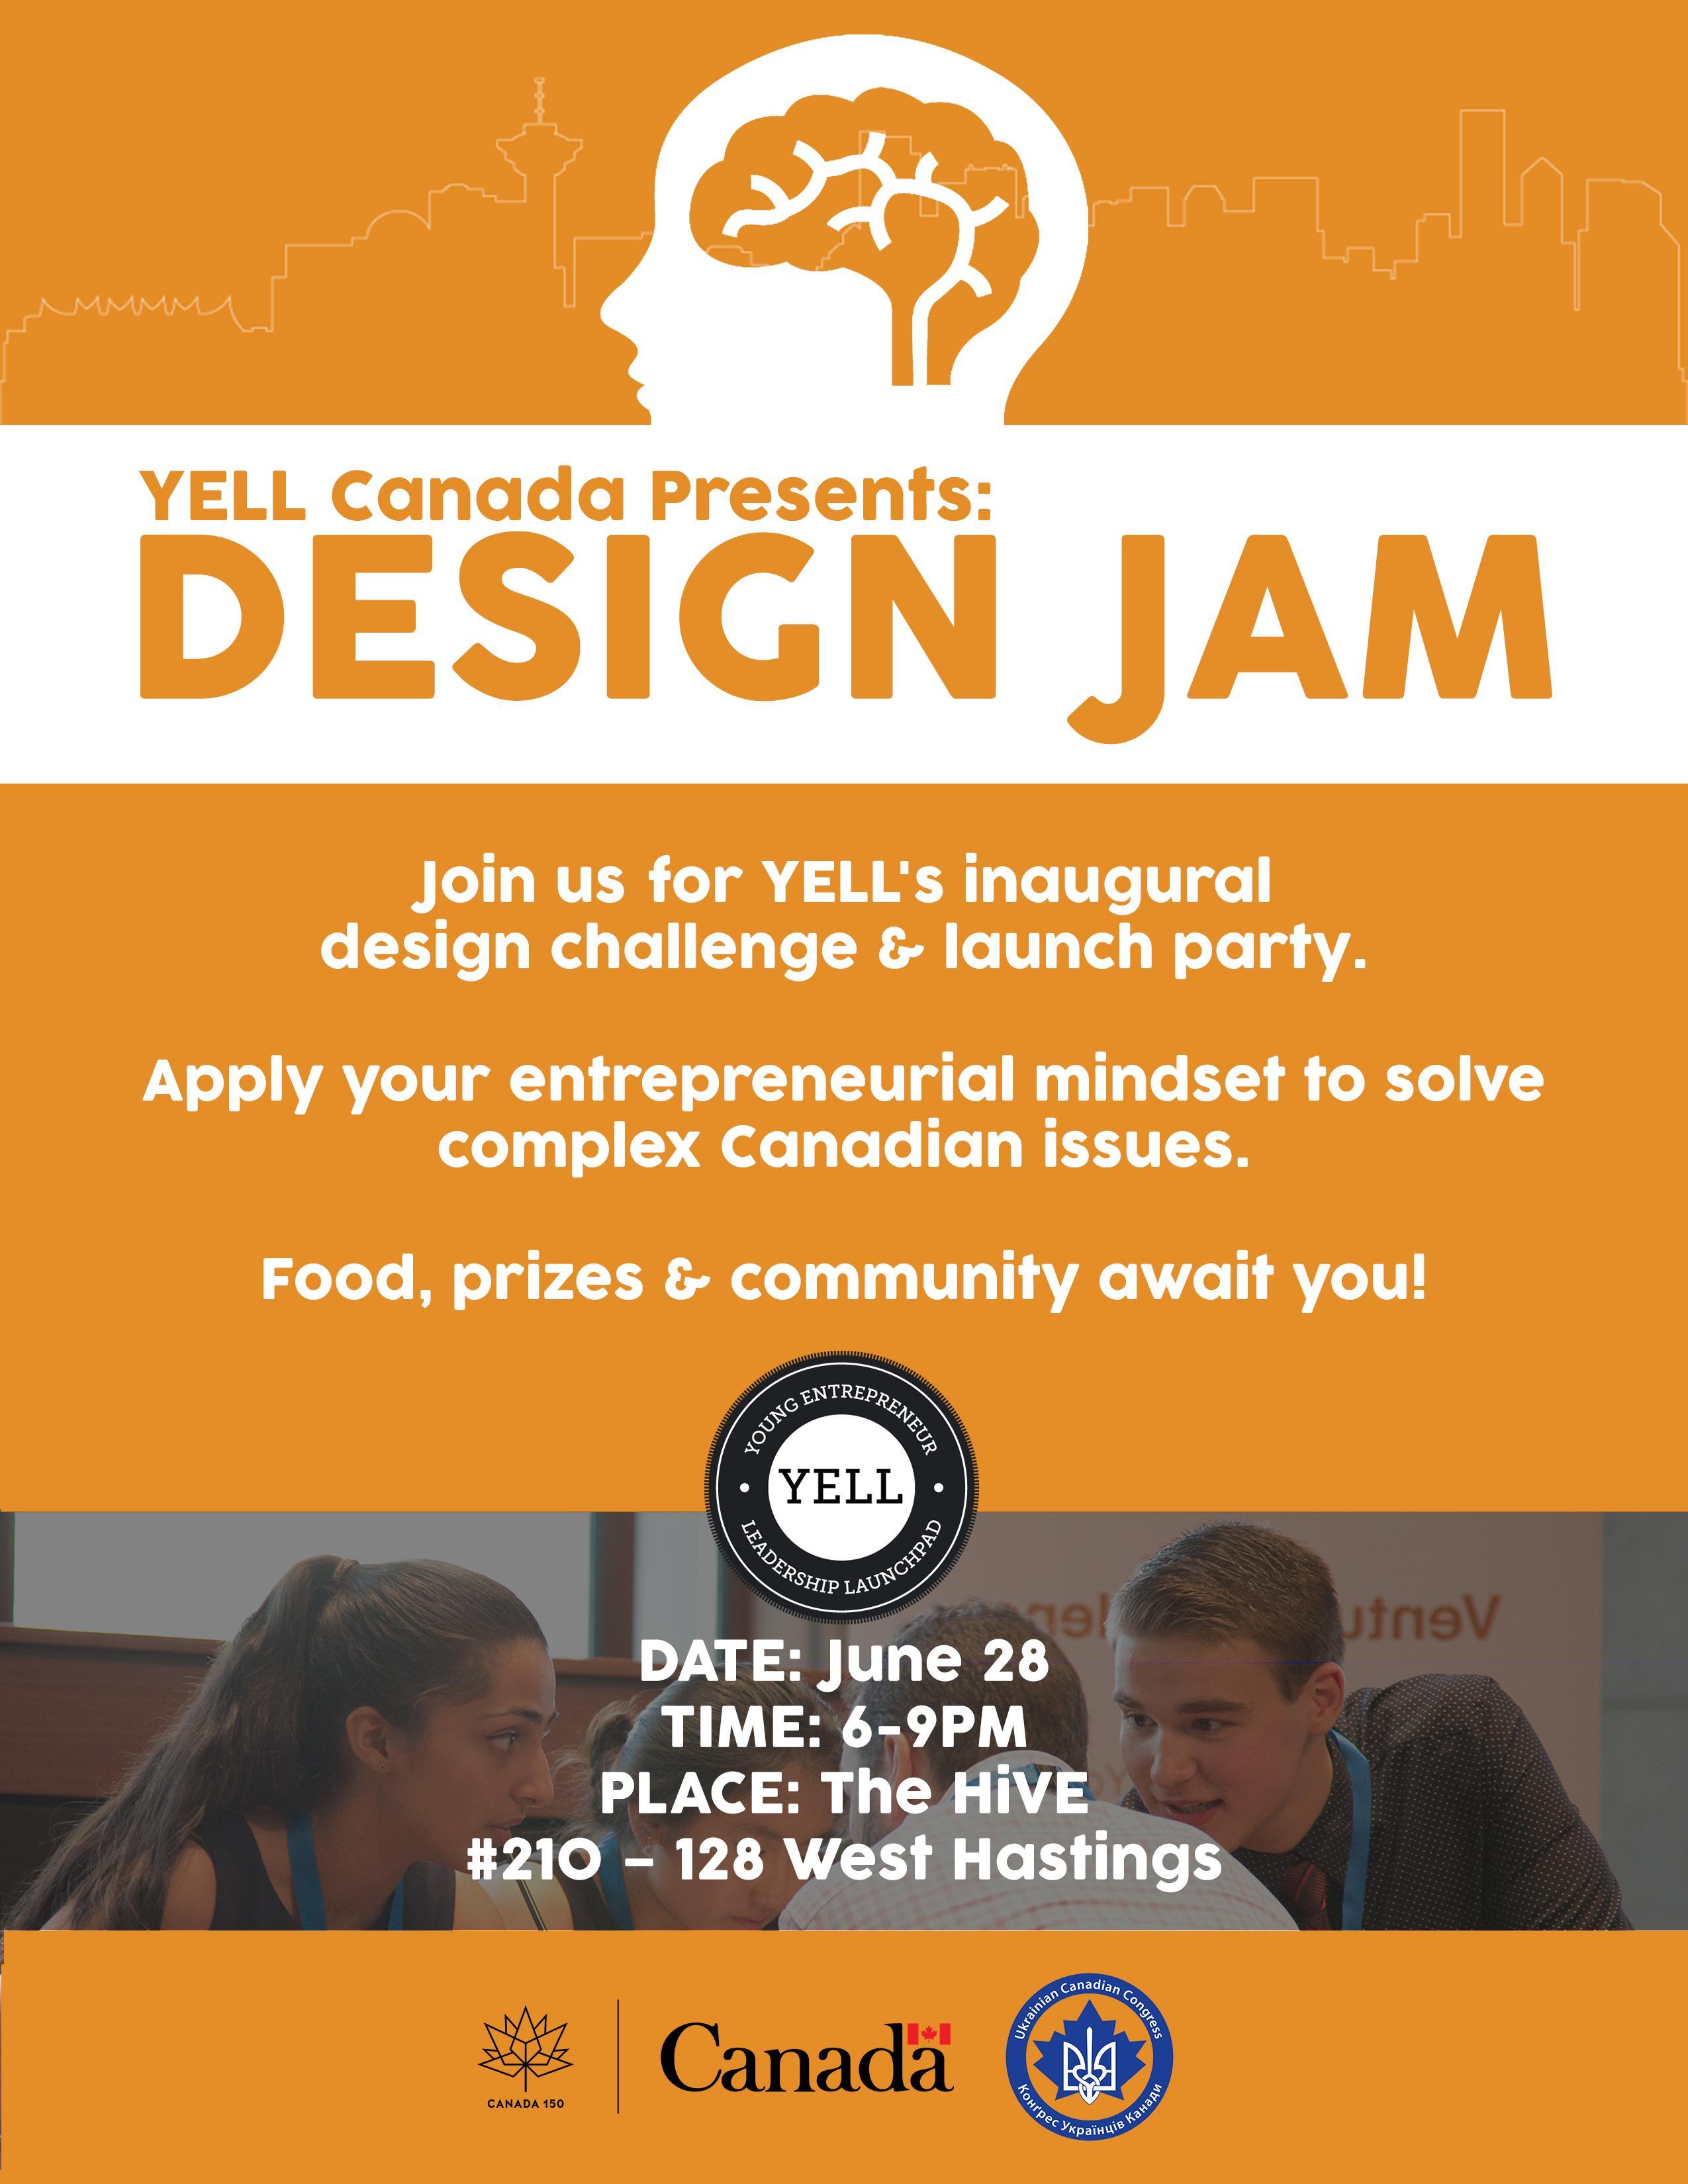 YELL Canada Presents: Design Jam